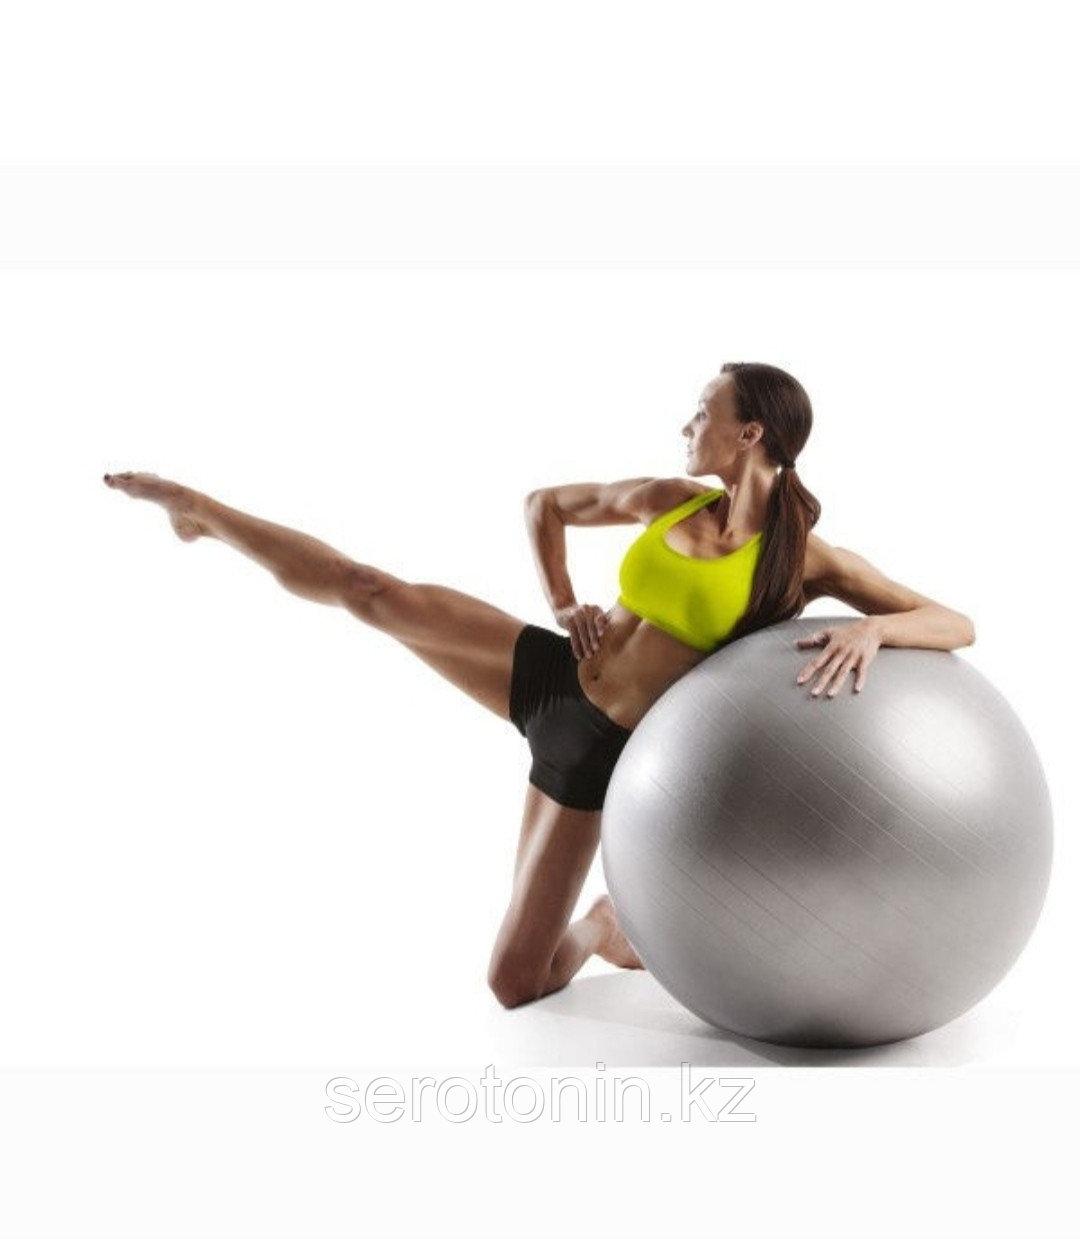 Мяч гимнастический (Фитбол) 65 см - фото 4